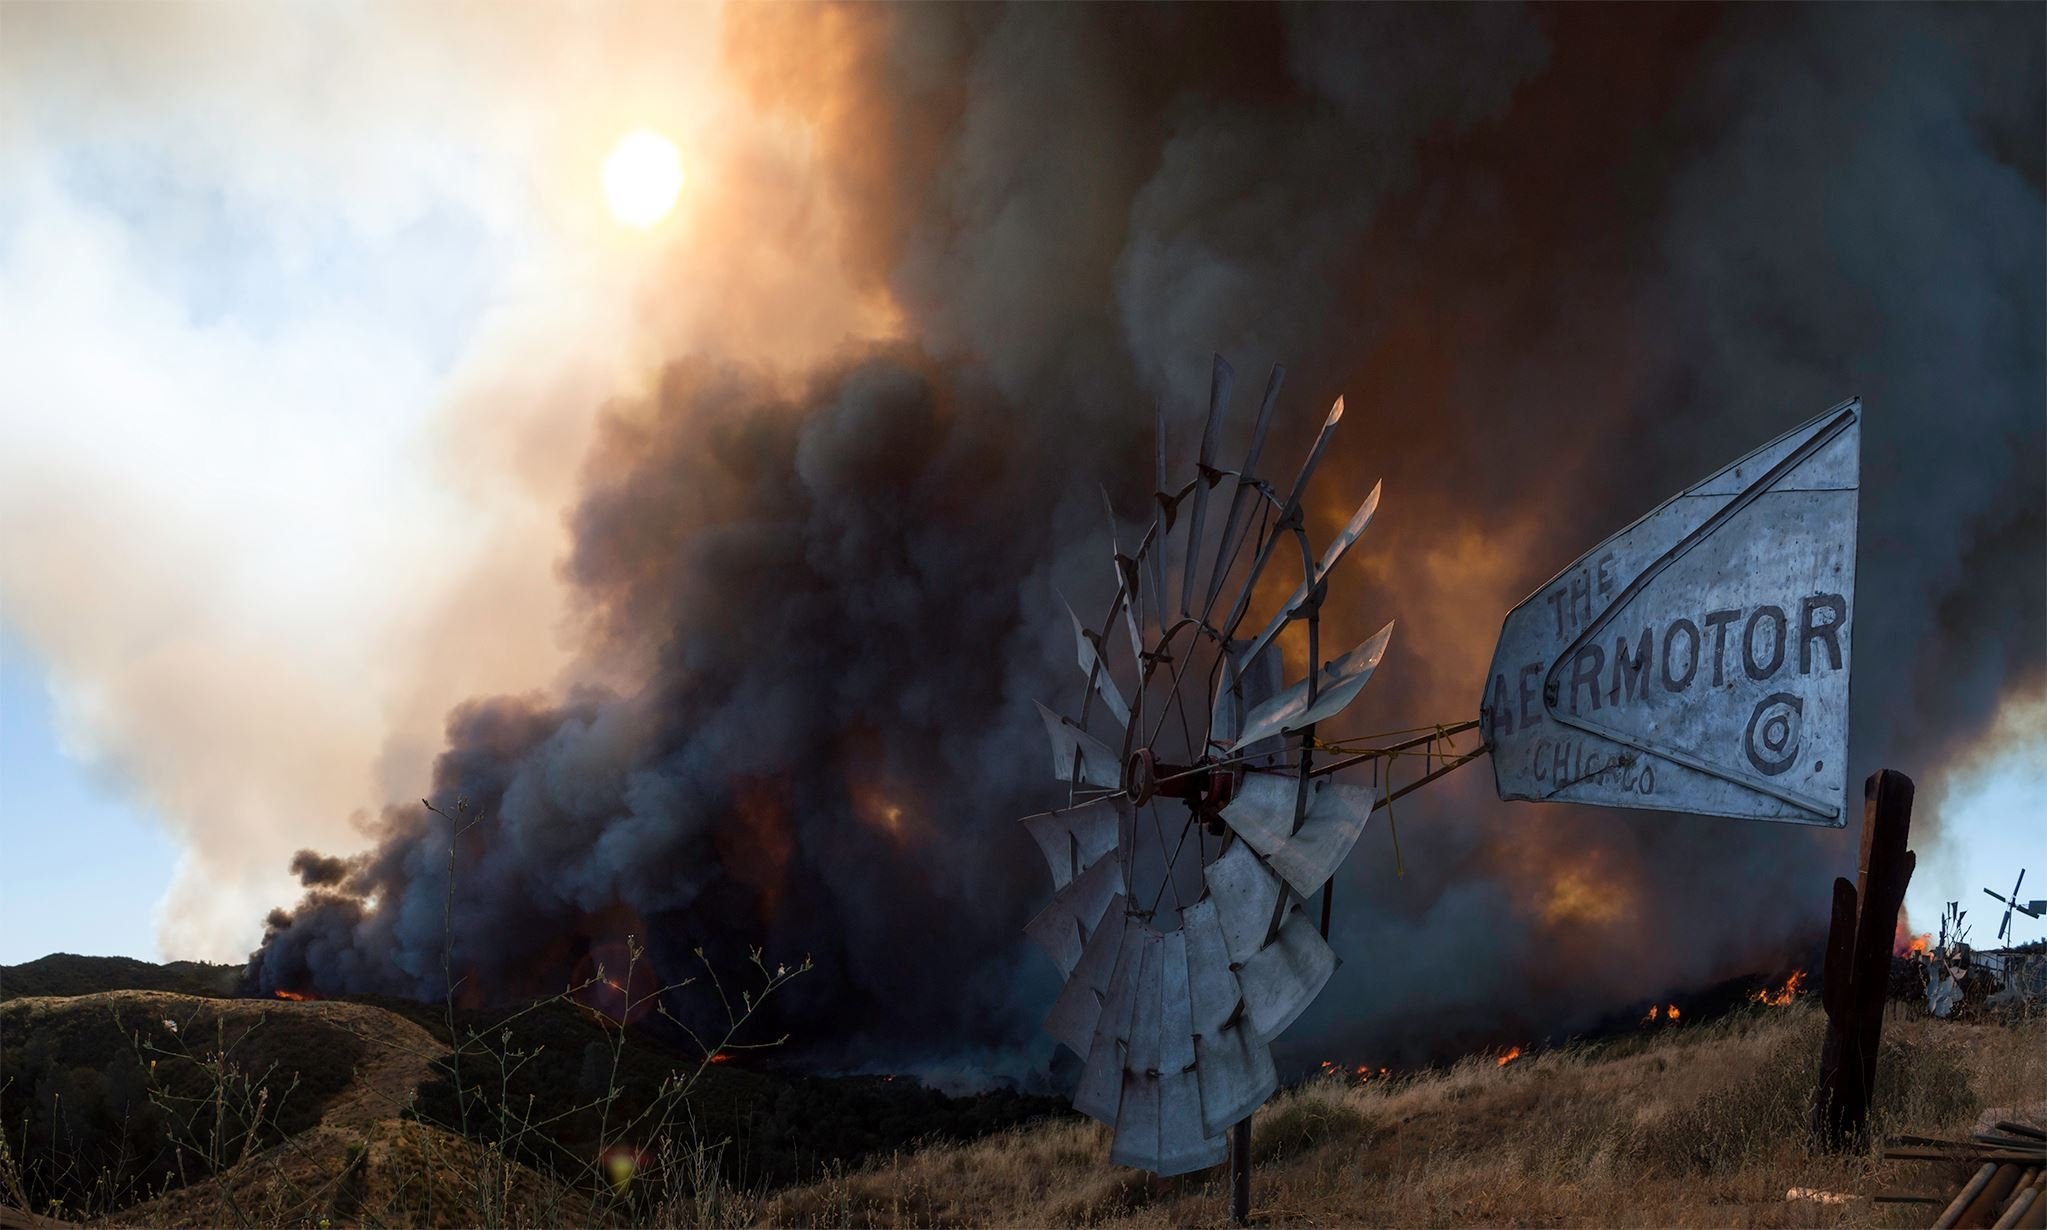 Hill Fire photo by Jonvieve Grist